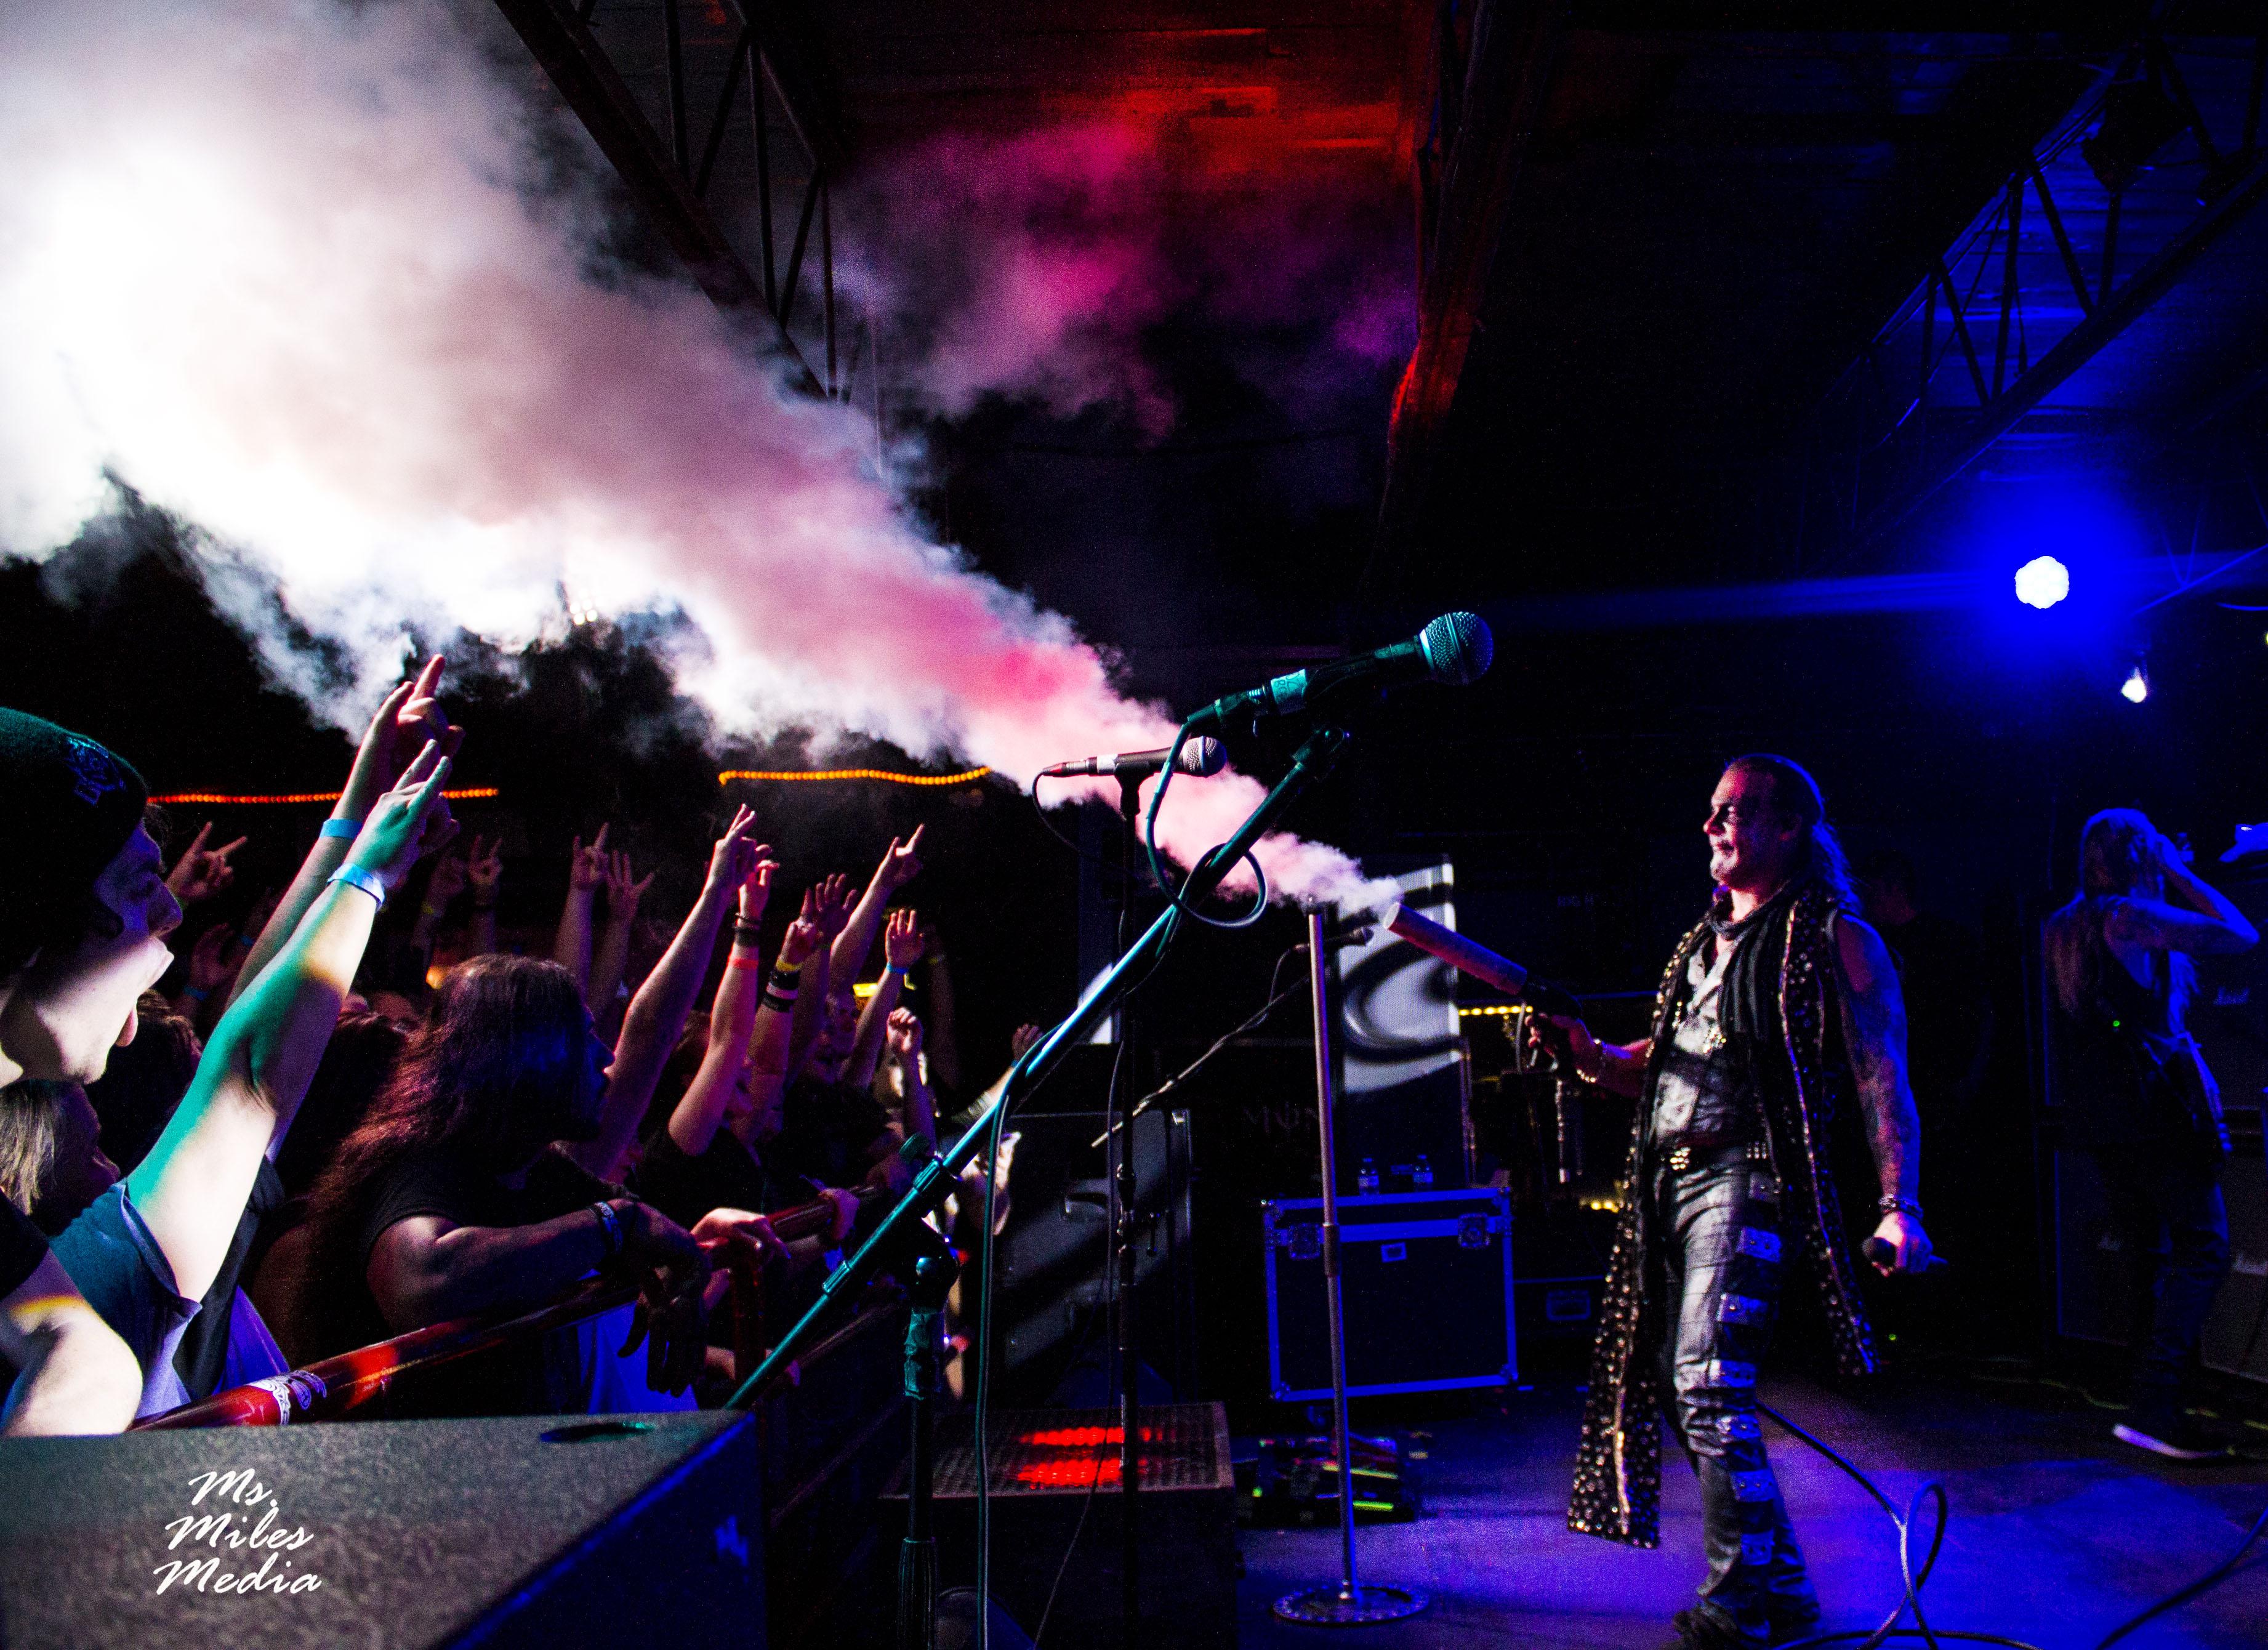 Fozzy, Adelitas Way bring The Judas Tour to Aftershock